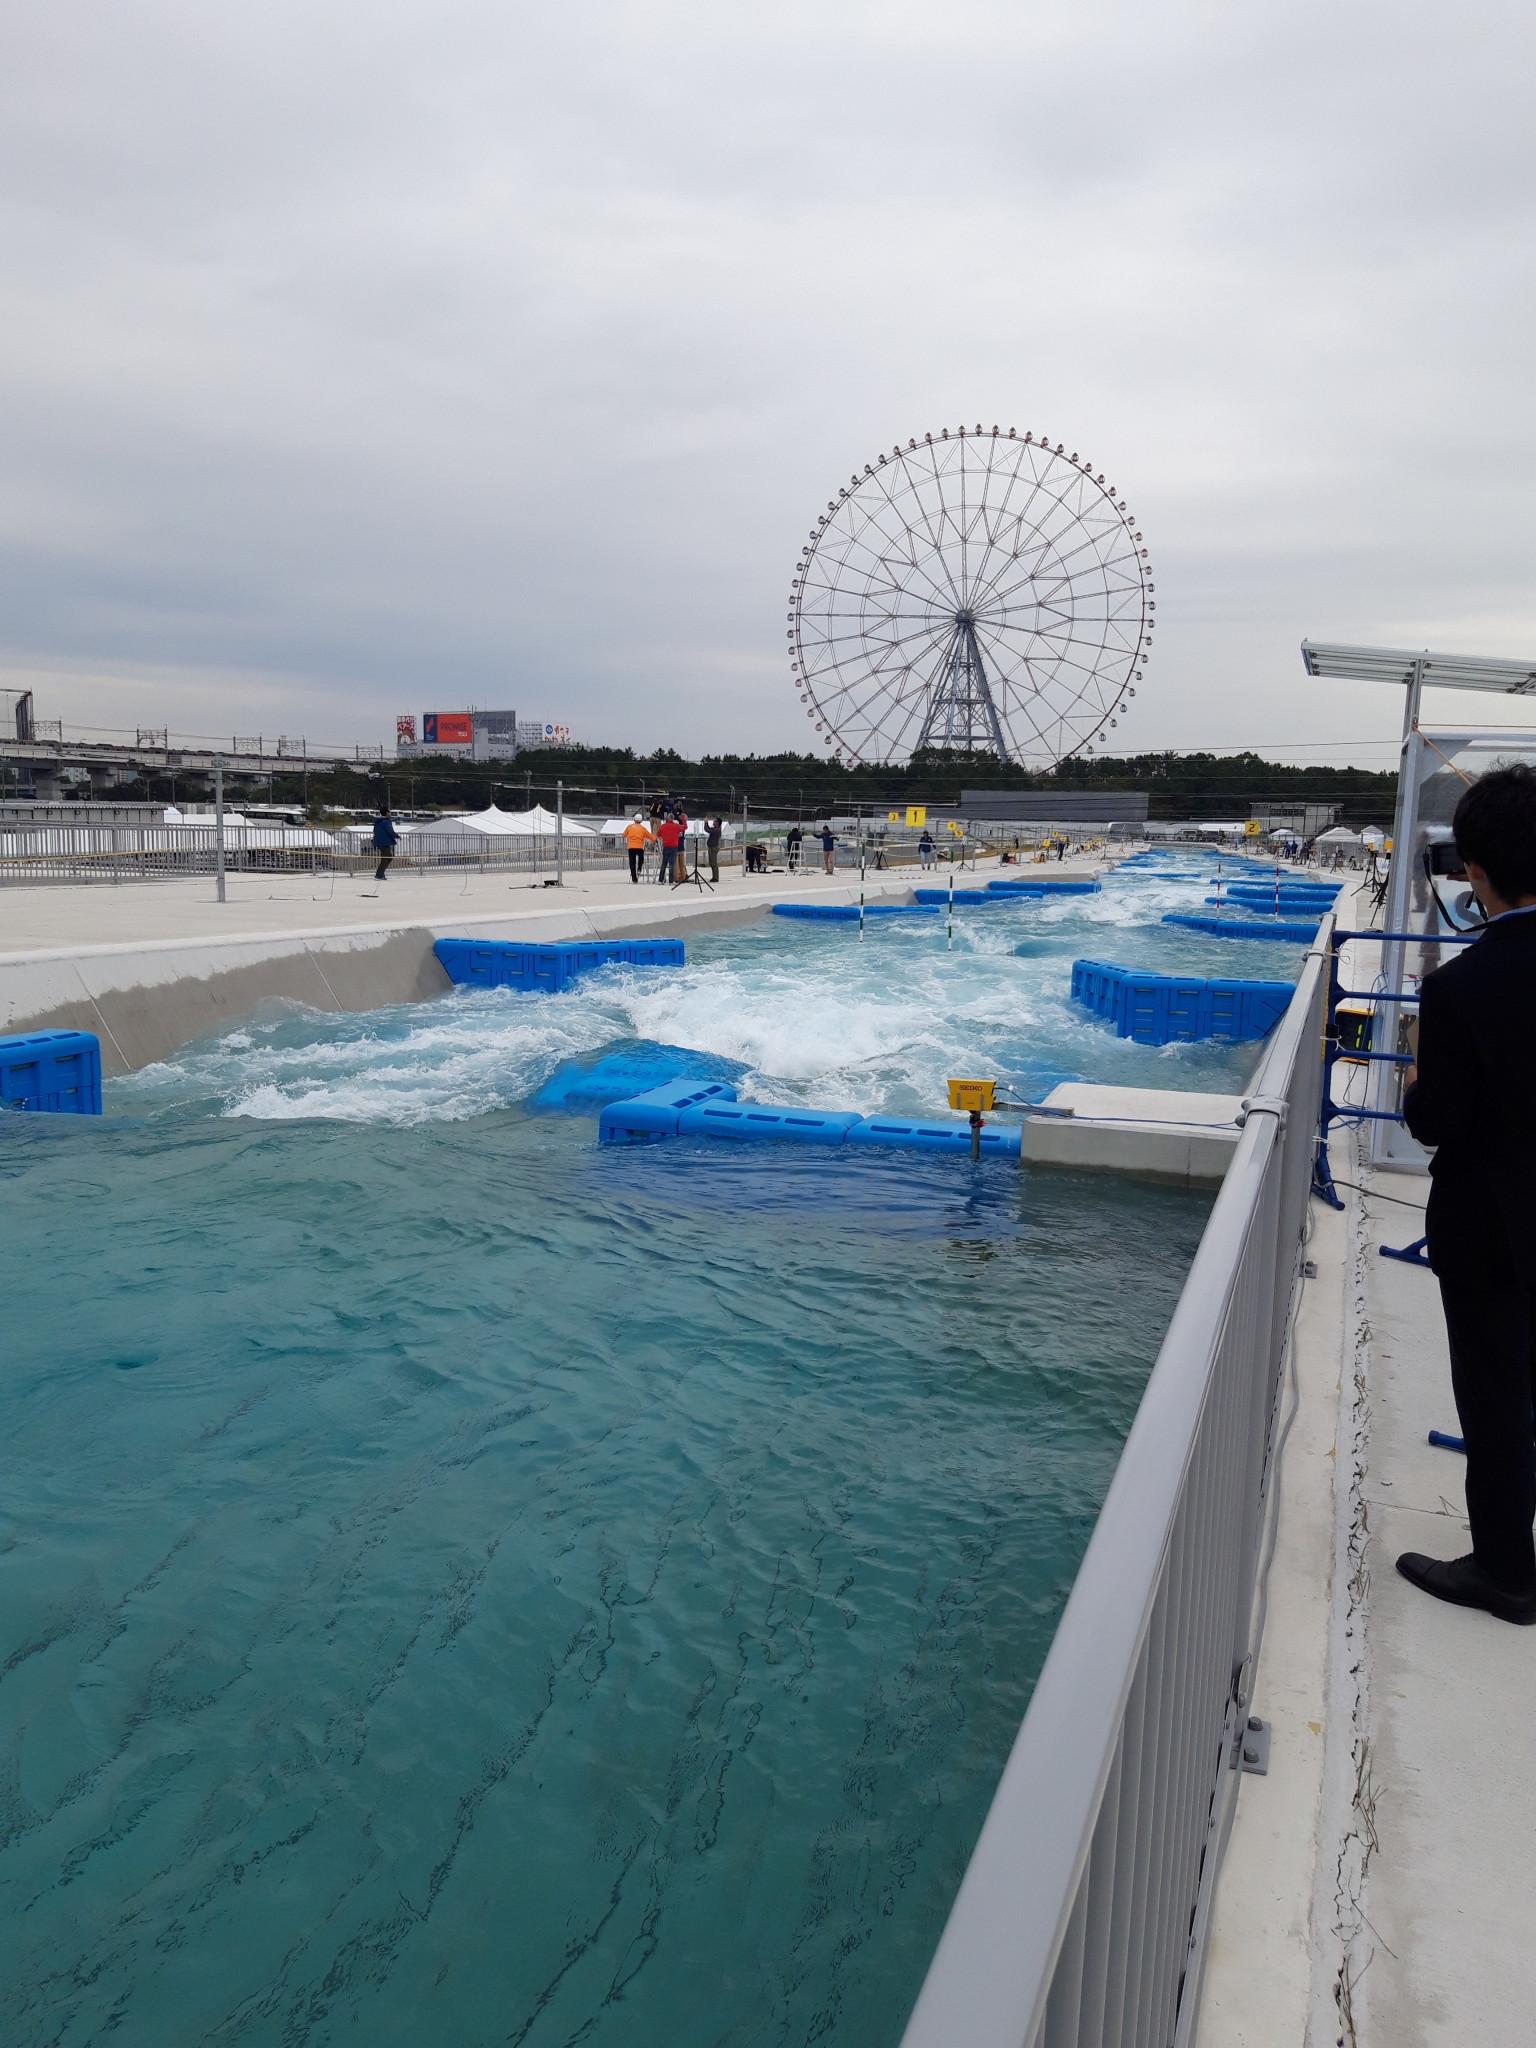 Kasai Canoe Slalom Centre is Japan's first man-made canoe slalom course ©ITG